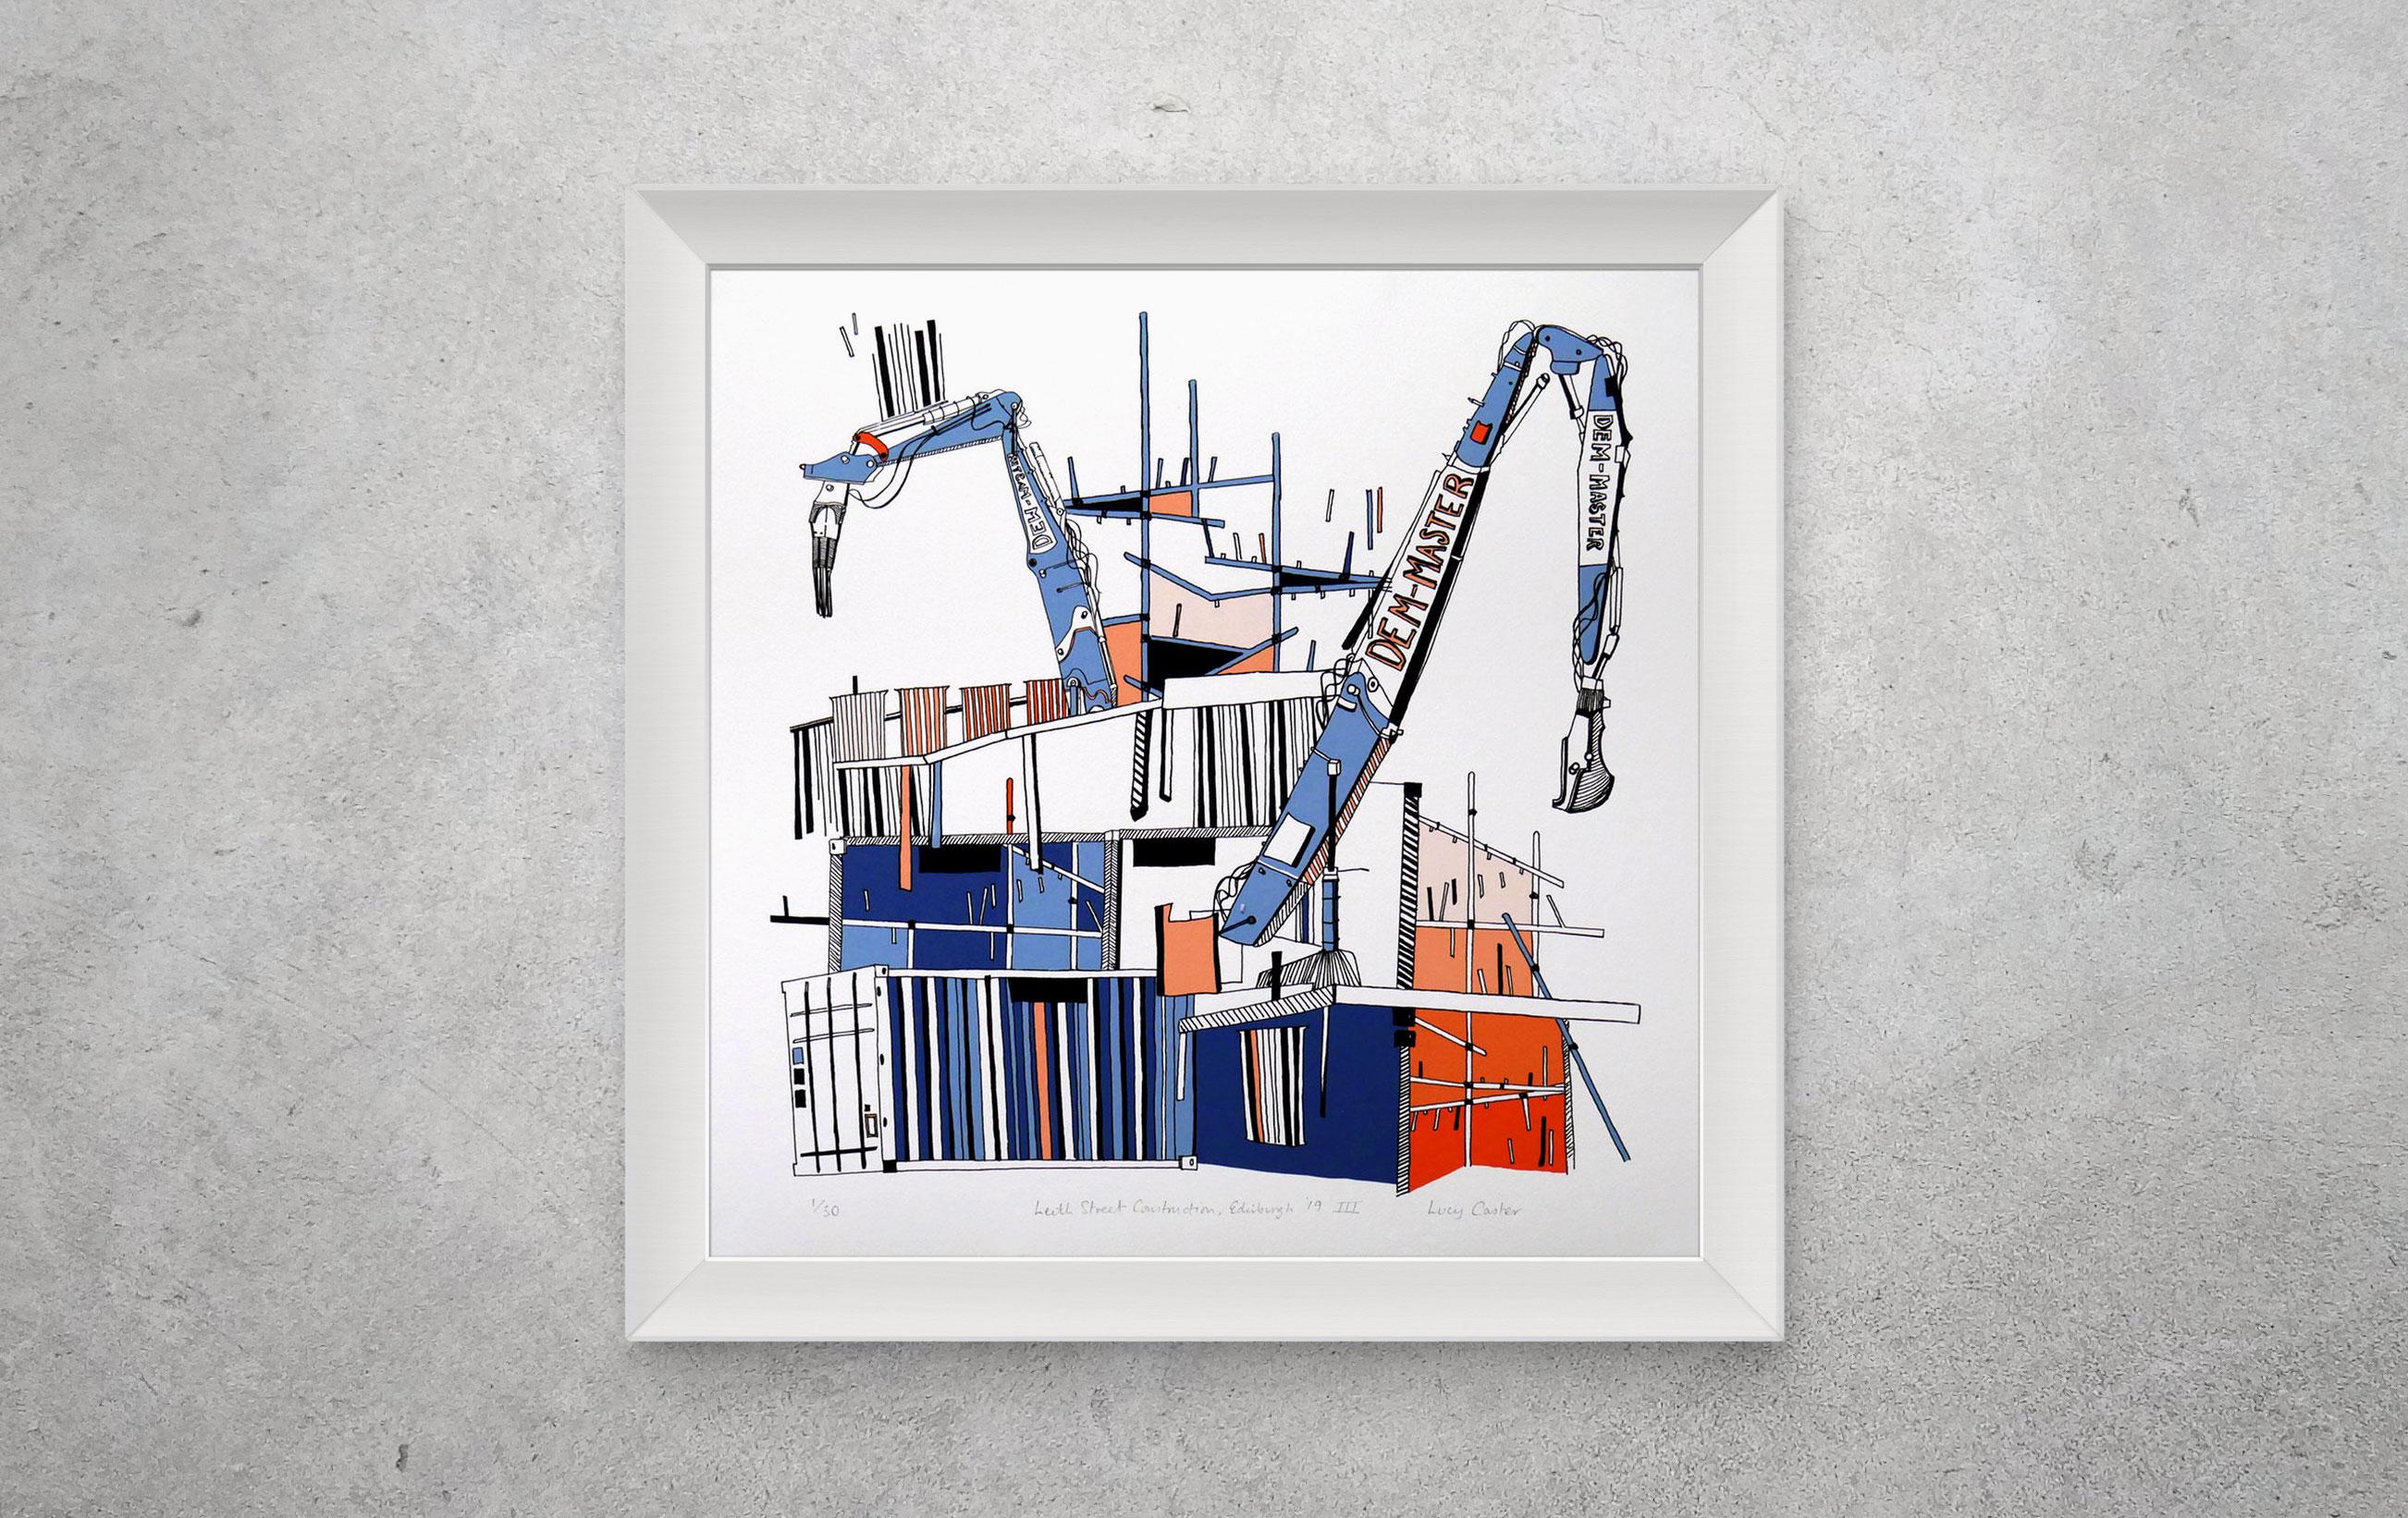 Leith-Street-Construction